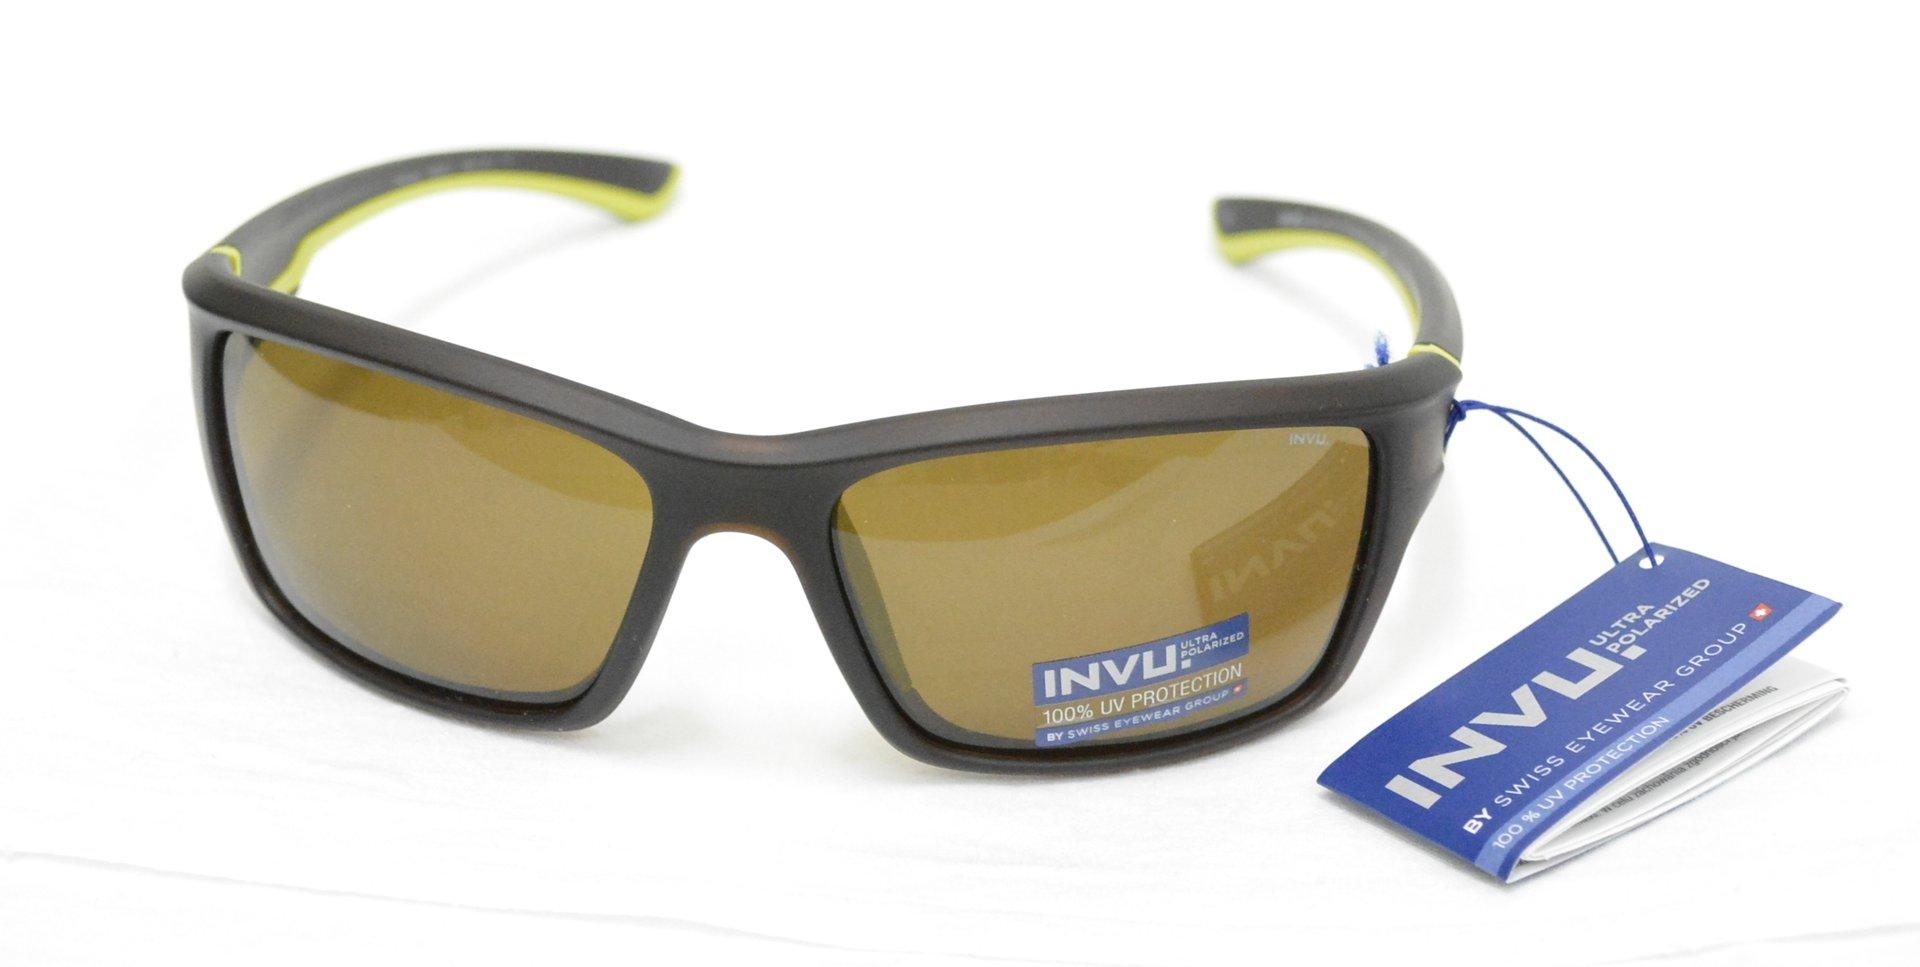 1acec6e680 Swiss Eyewear Group Italia S R L - eyewear near me